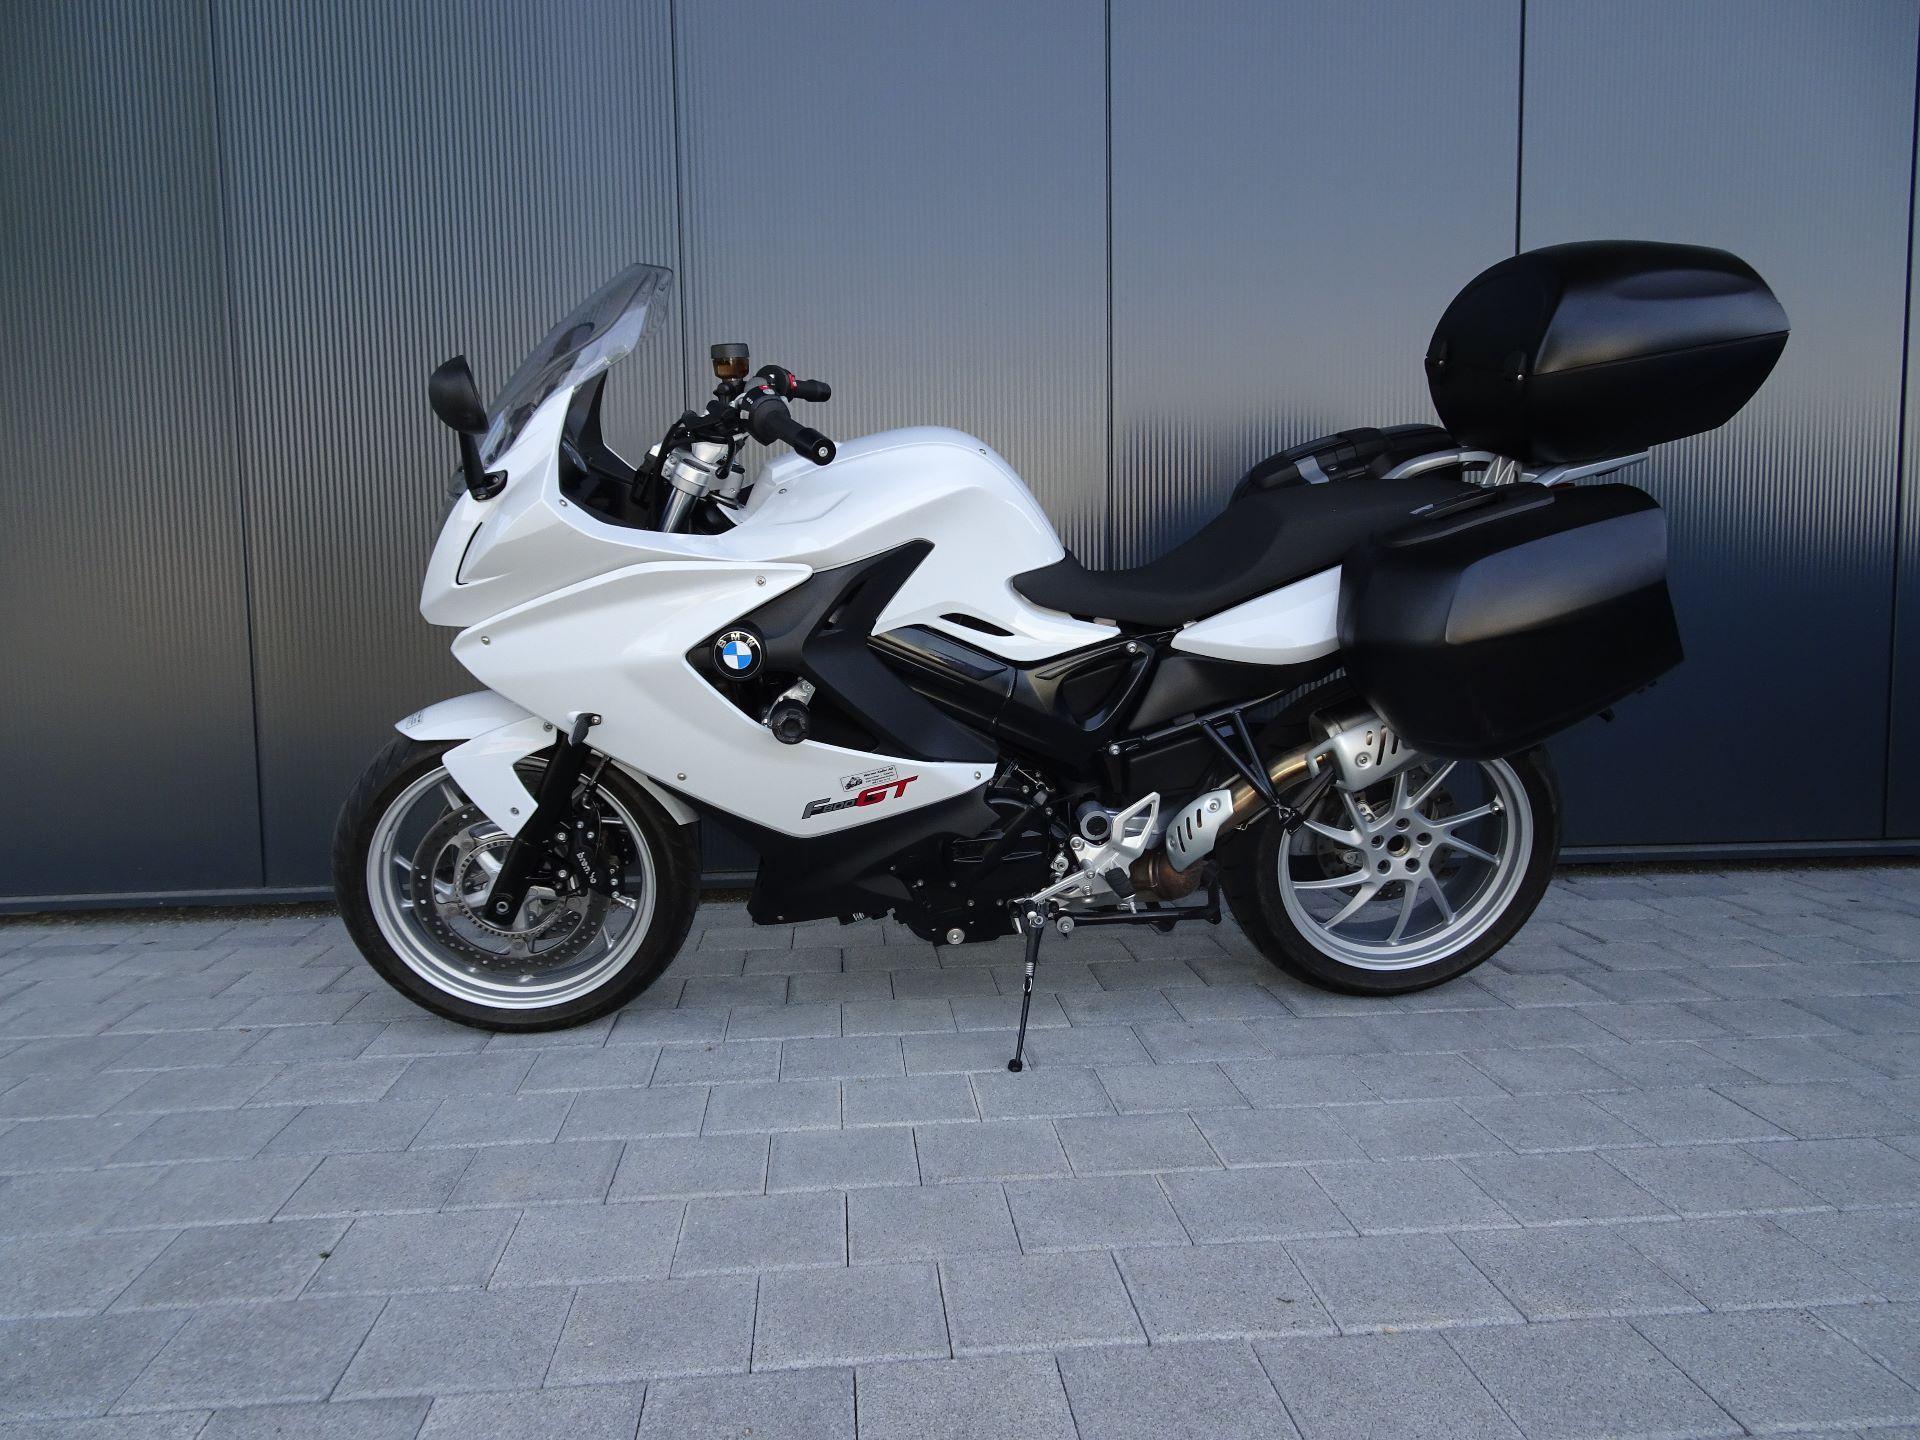 Bmw F 800 Gt Occasion : motorrad occasion kaufen bmw f 800 gt abs keller motos ag siggenthal station ~ Gottalentnigeria.com Avis de Voitures